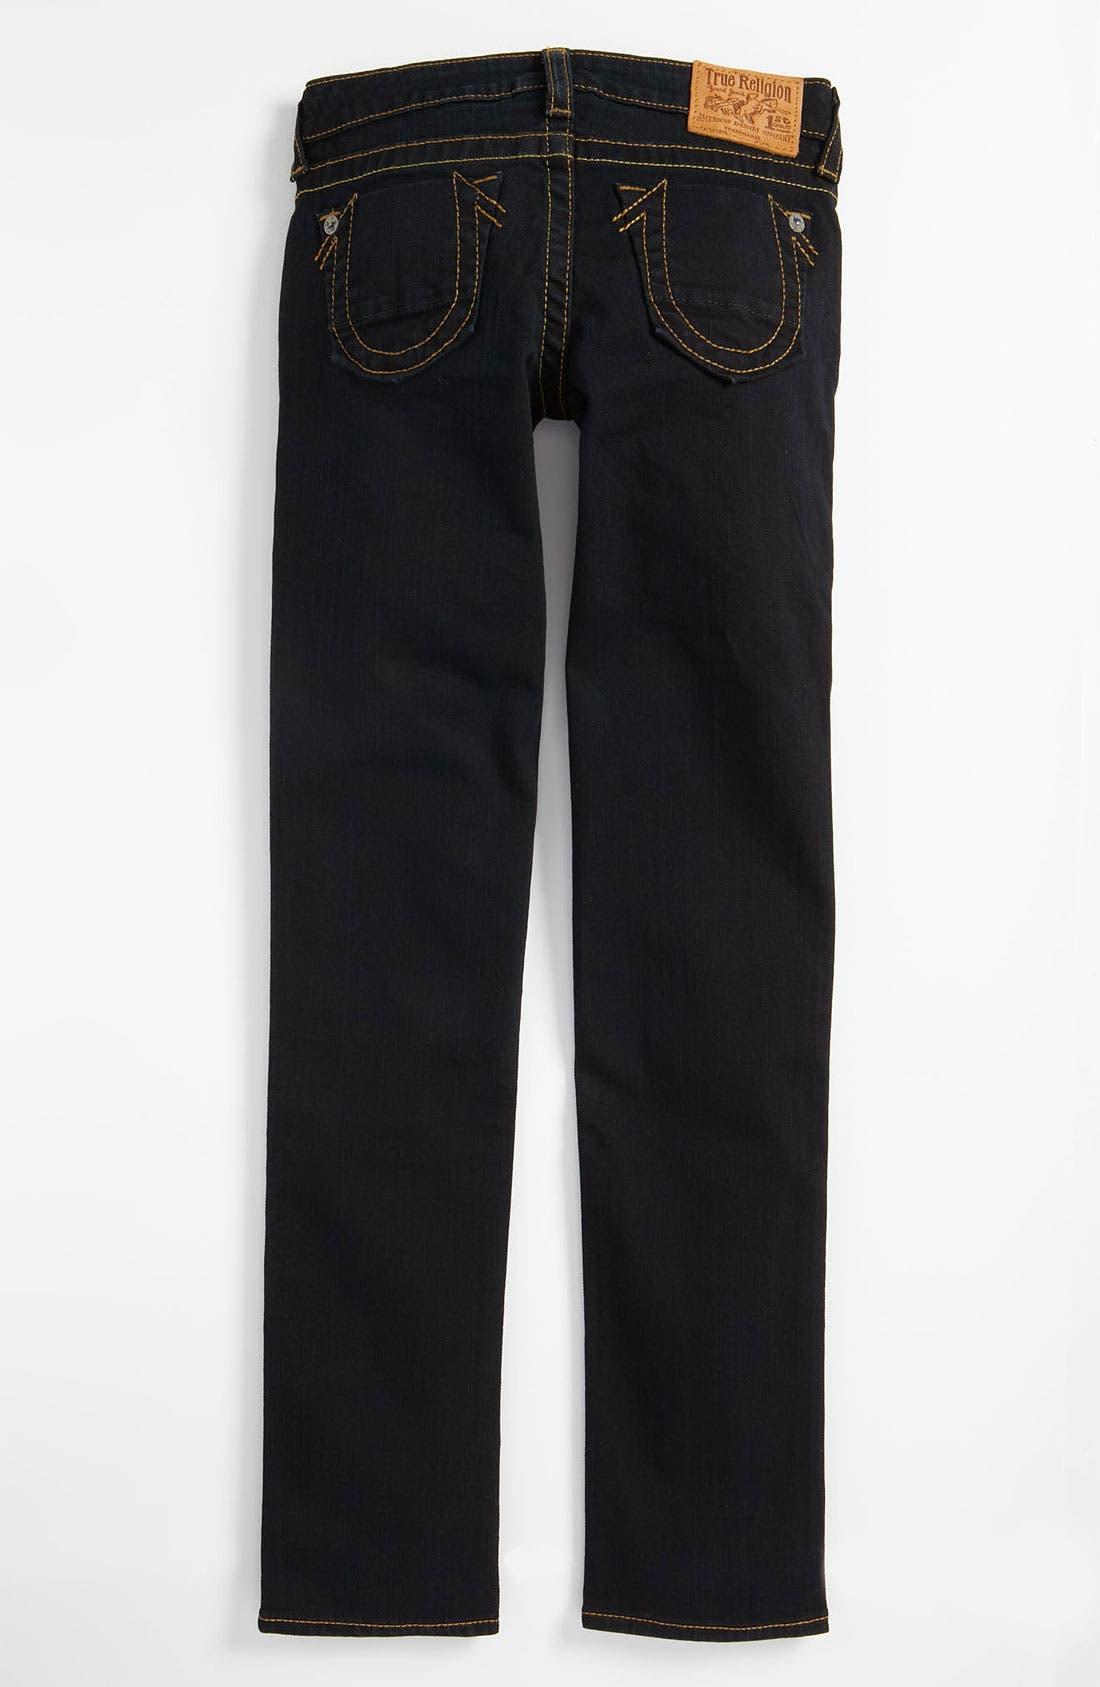 Main Image - True Religion Brand Jeans 'Stella' Skinny Jeans (Little Girls & Big Girls)